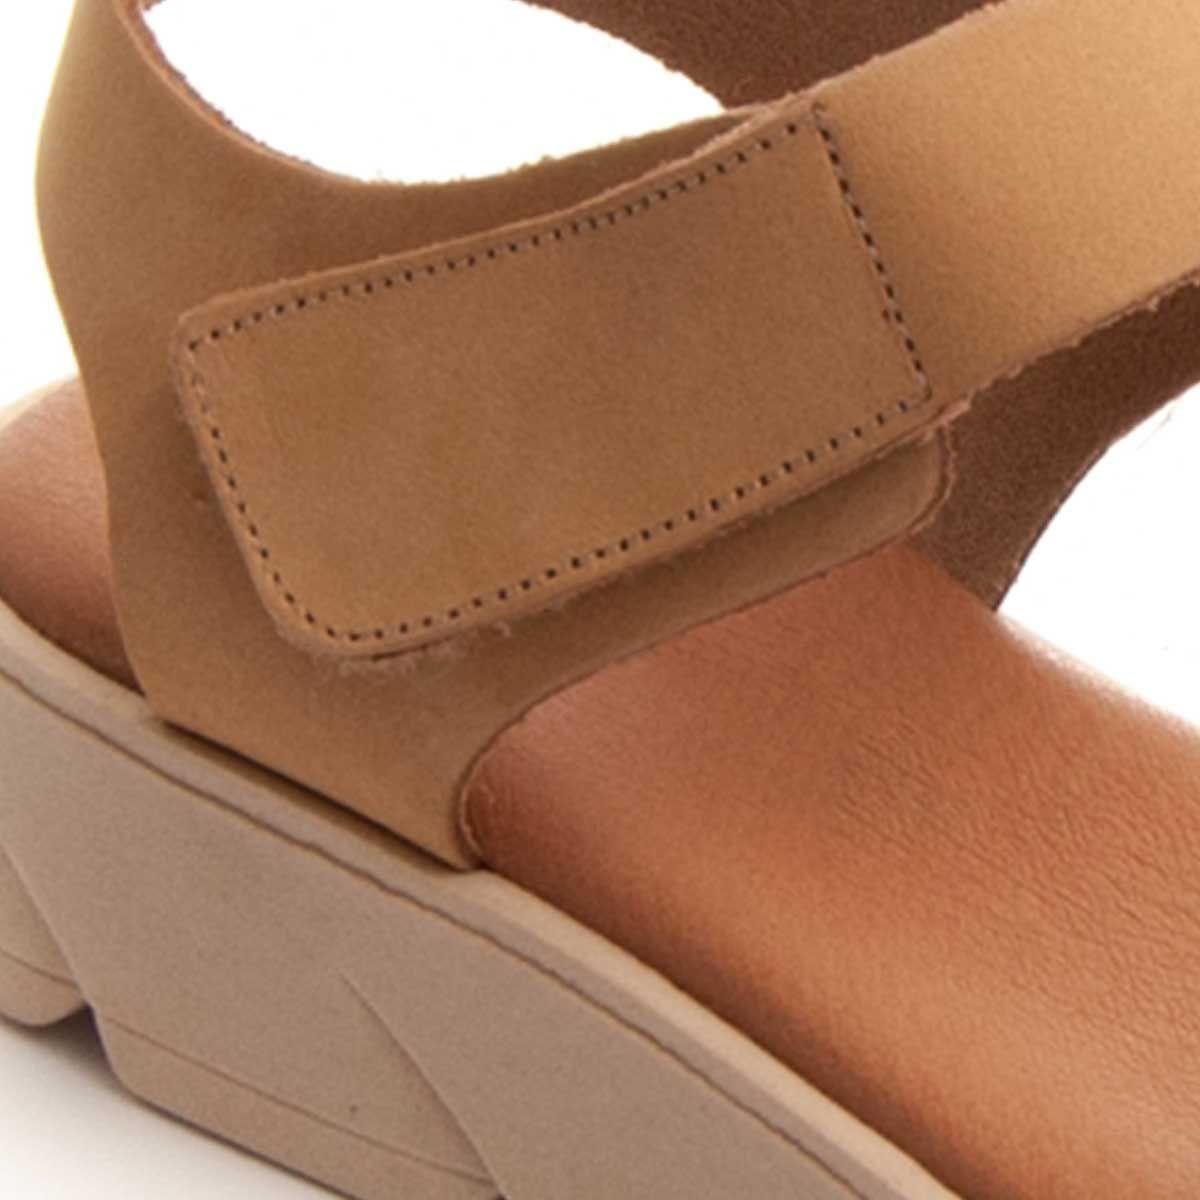 Purapiel Strappy Sandal in Camel